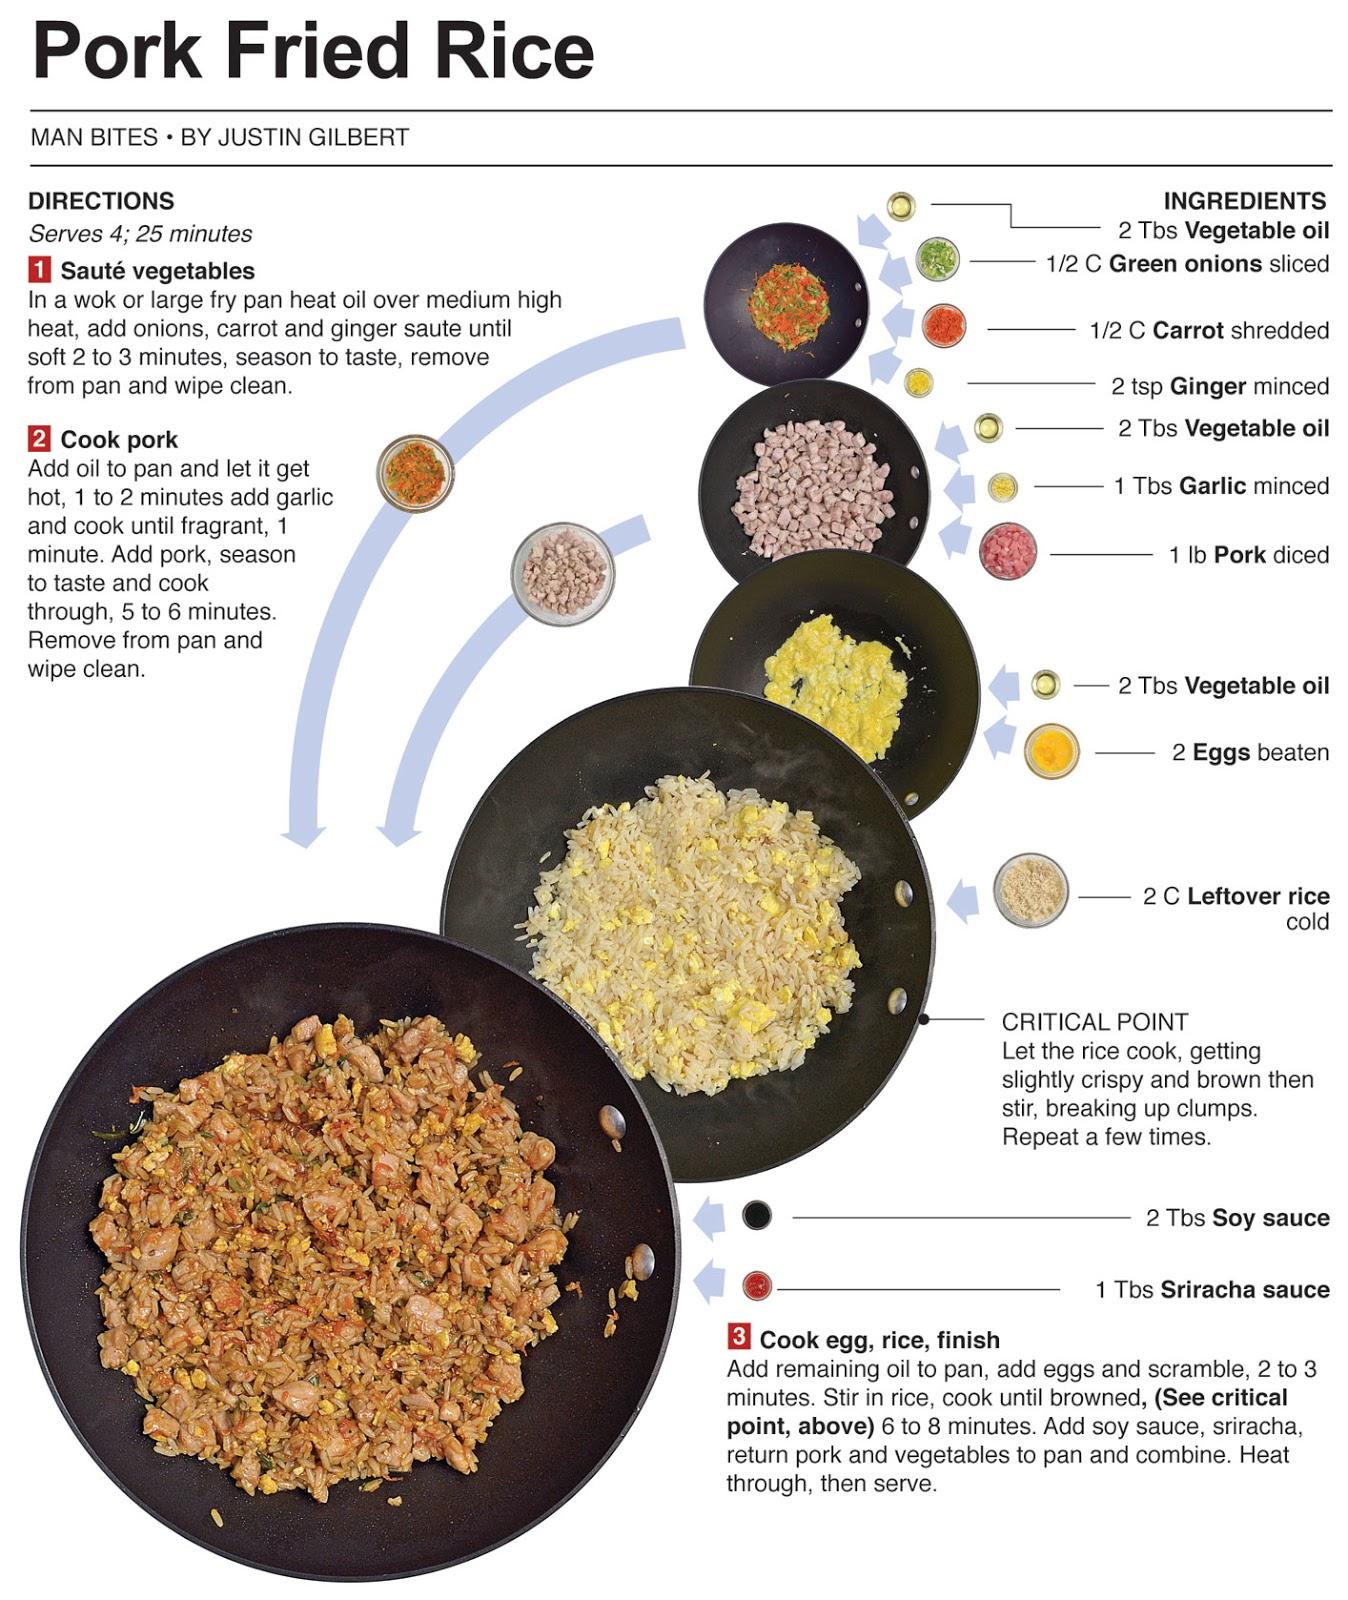 Behind the Bites: Pork Fried Rice